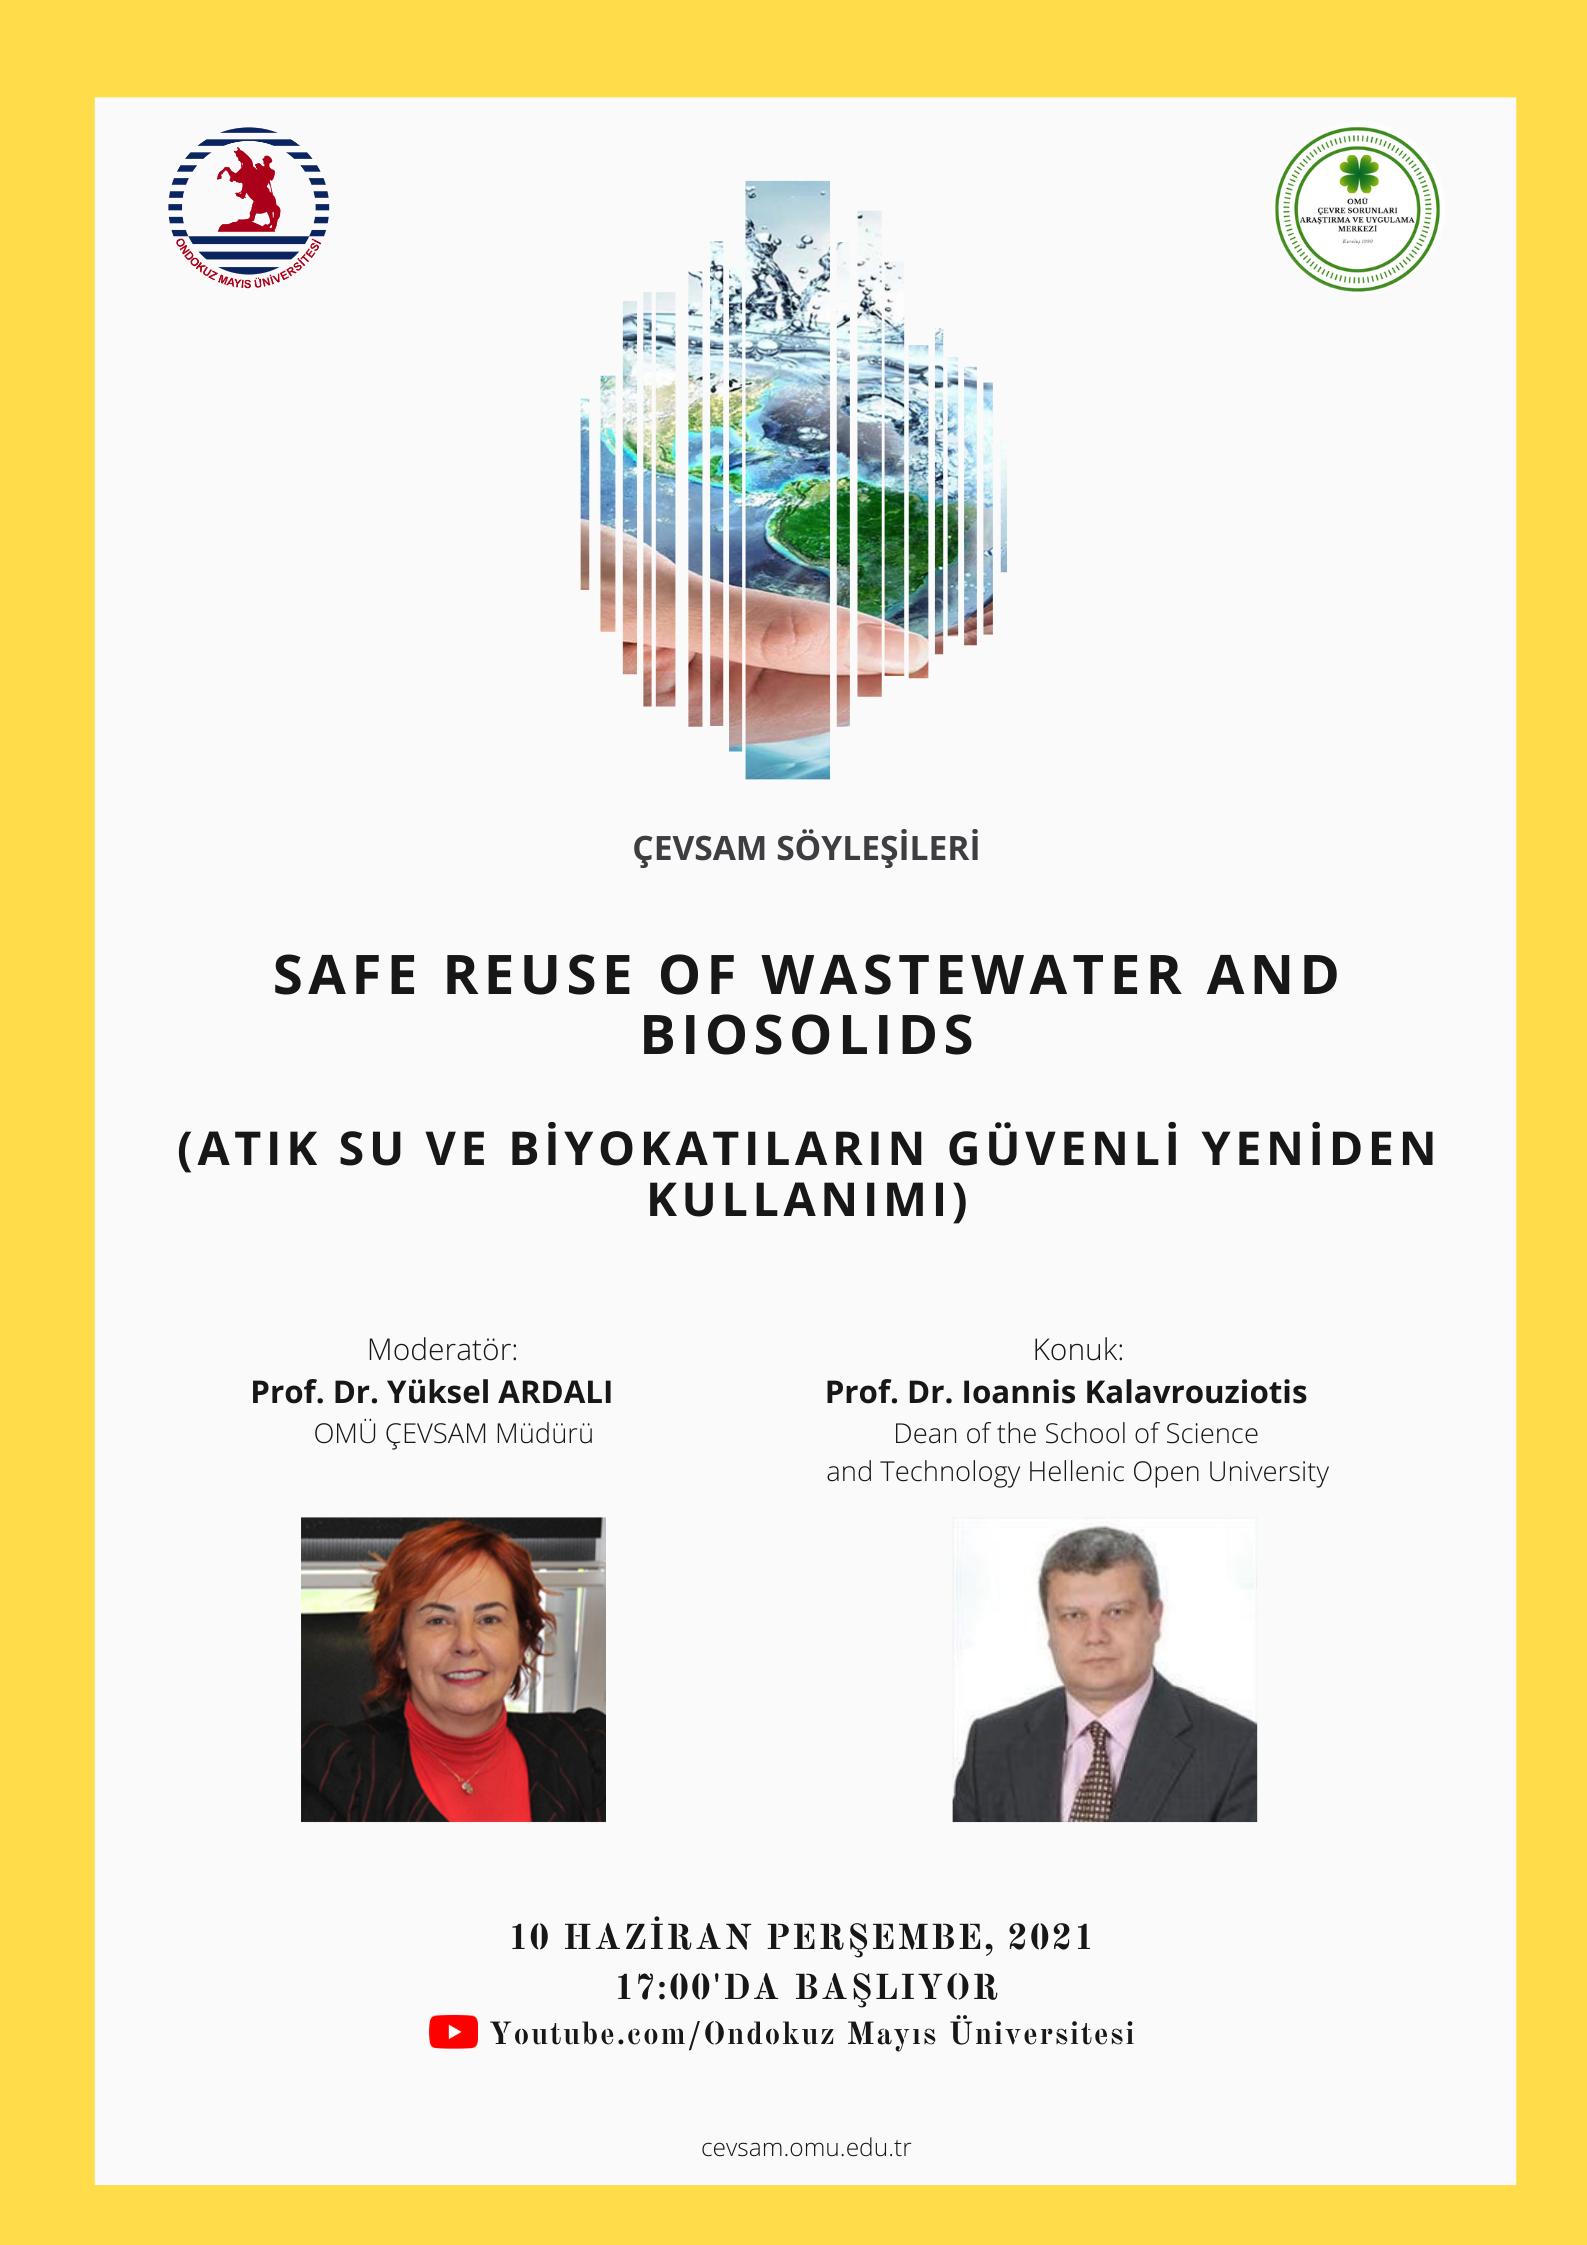 https://www.omu.edu.tr/sites/default/files/10_haziran_cevsam_soylesi-ioannis_kalavrouziotis.png